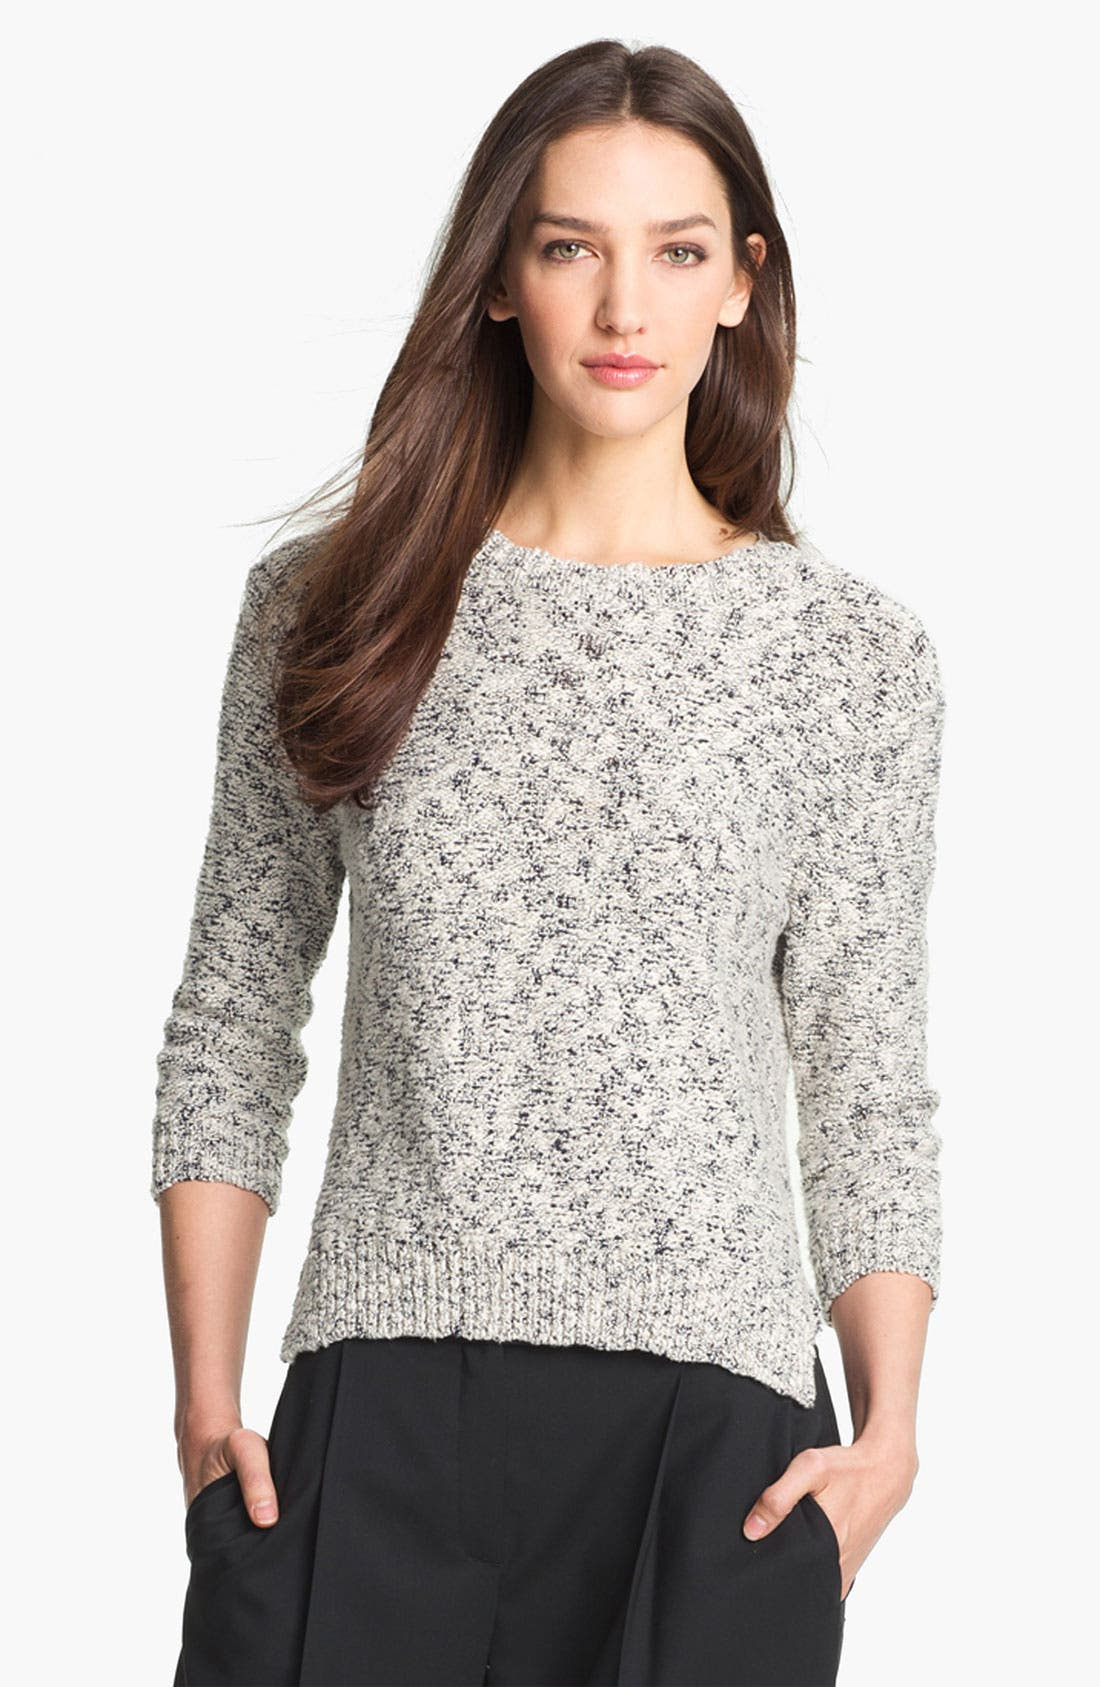 Main Image - Theory 'Rainee' Cotton Blend Sweater